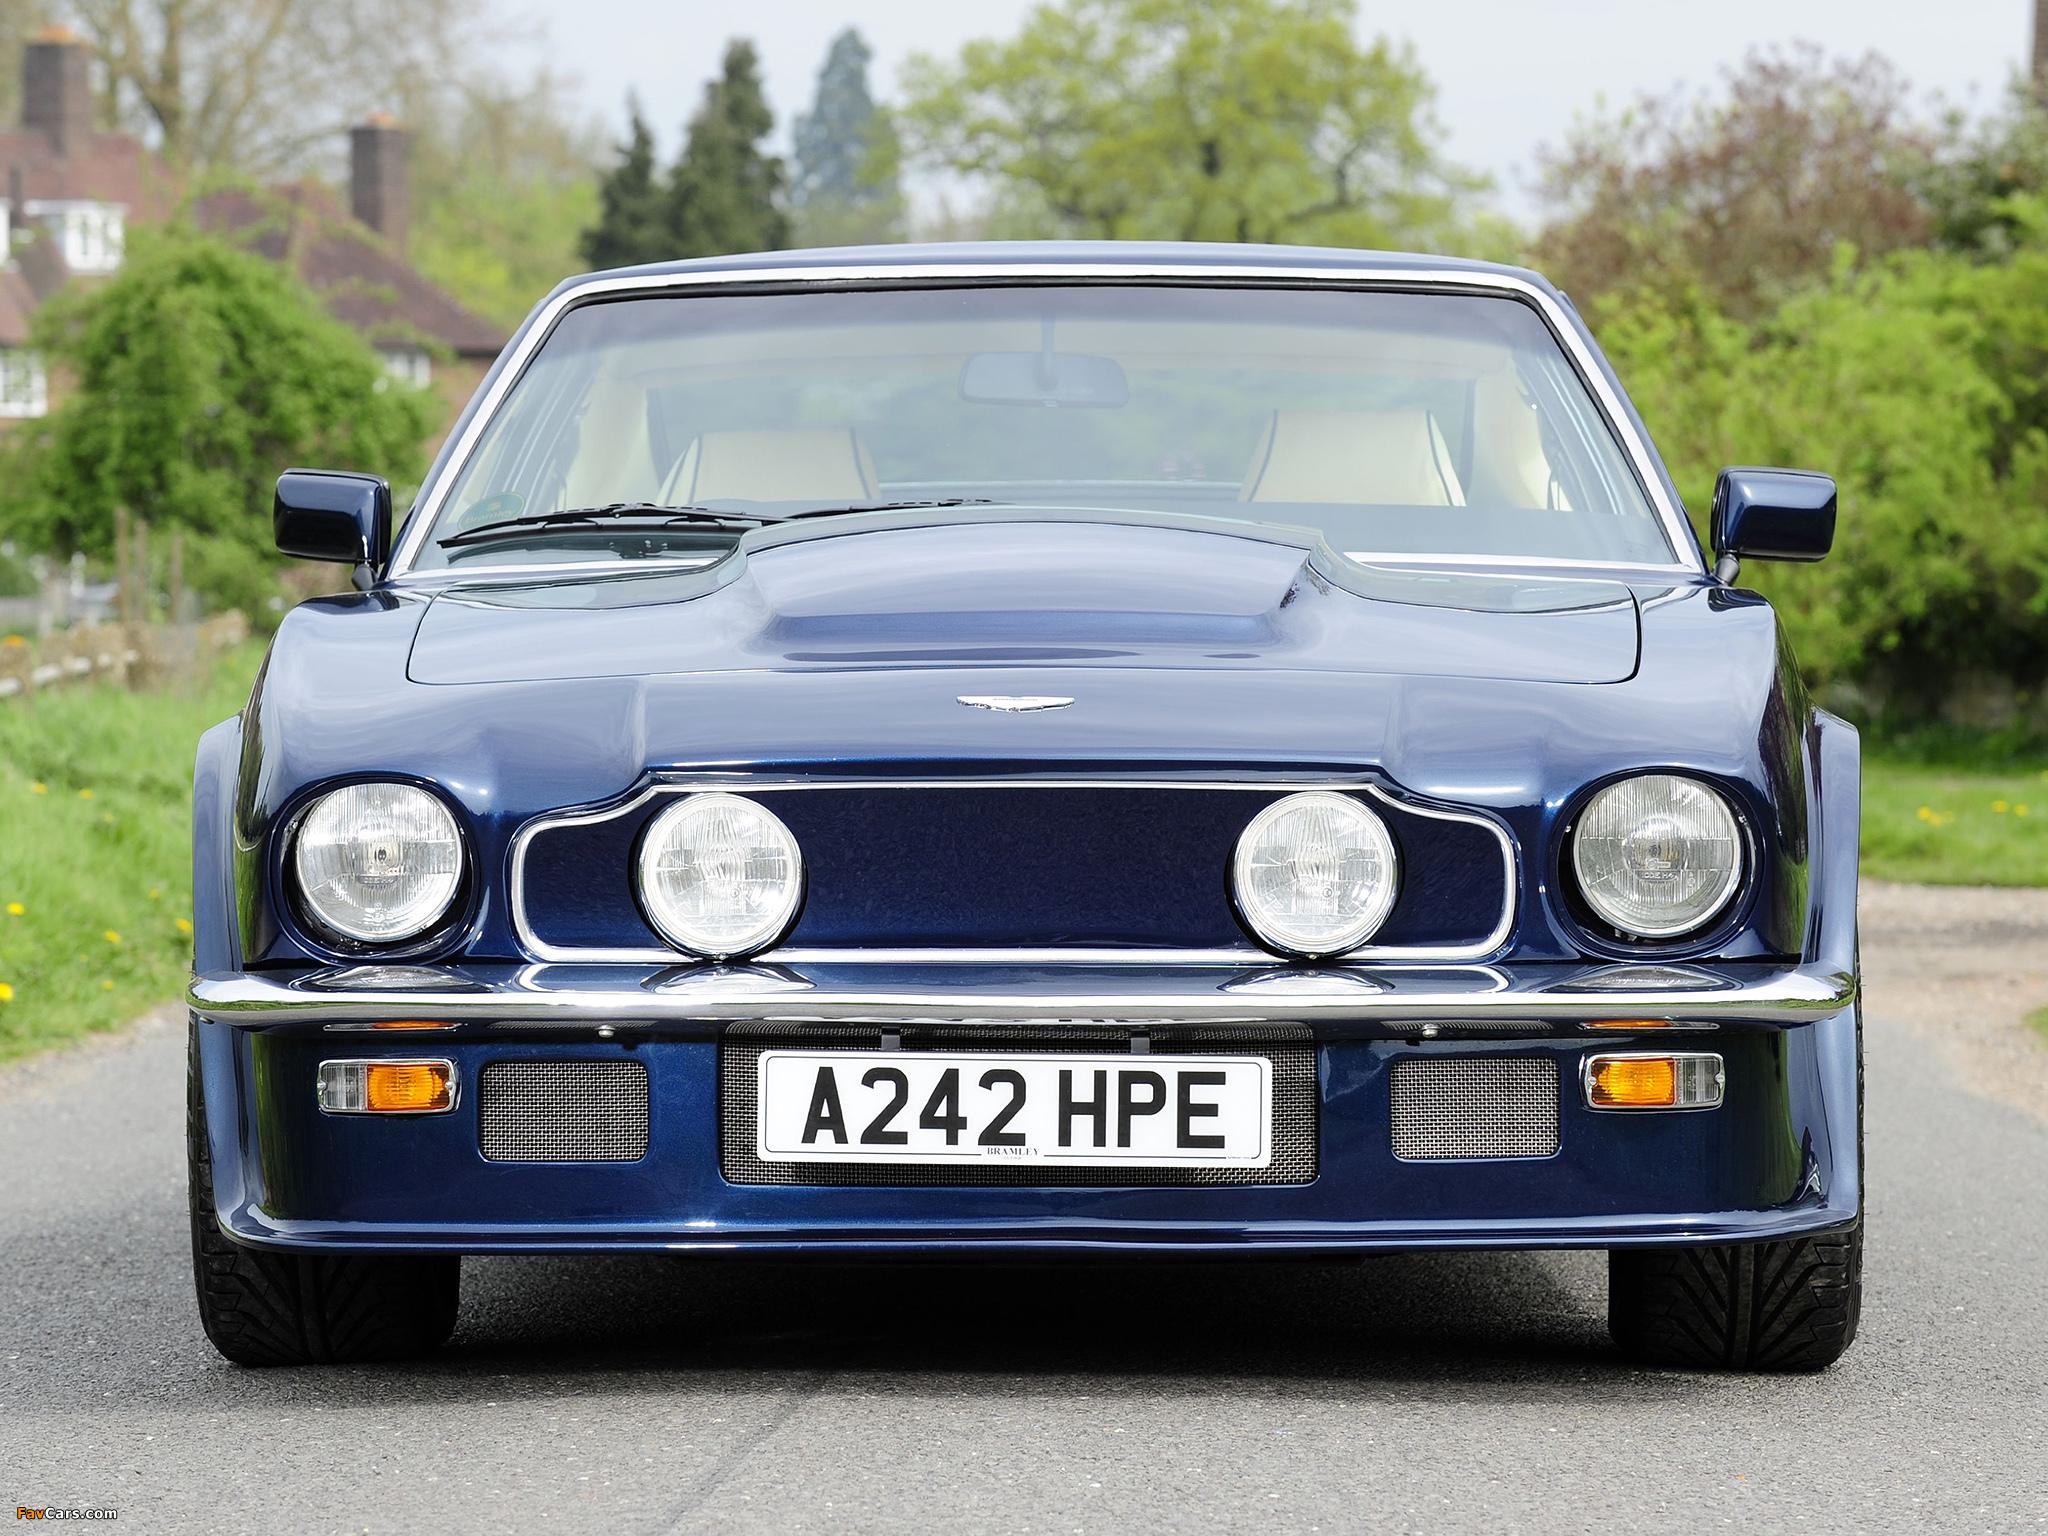 http://img.favcars.com/aston-martin/v8/photos_aston-martin_v8_1977_4.jpg